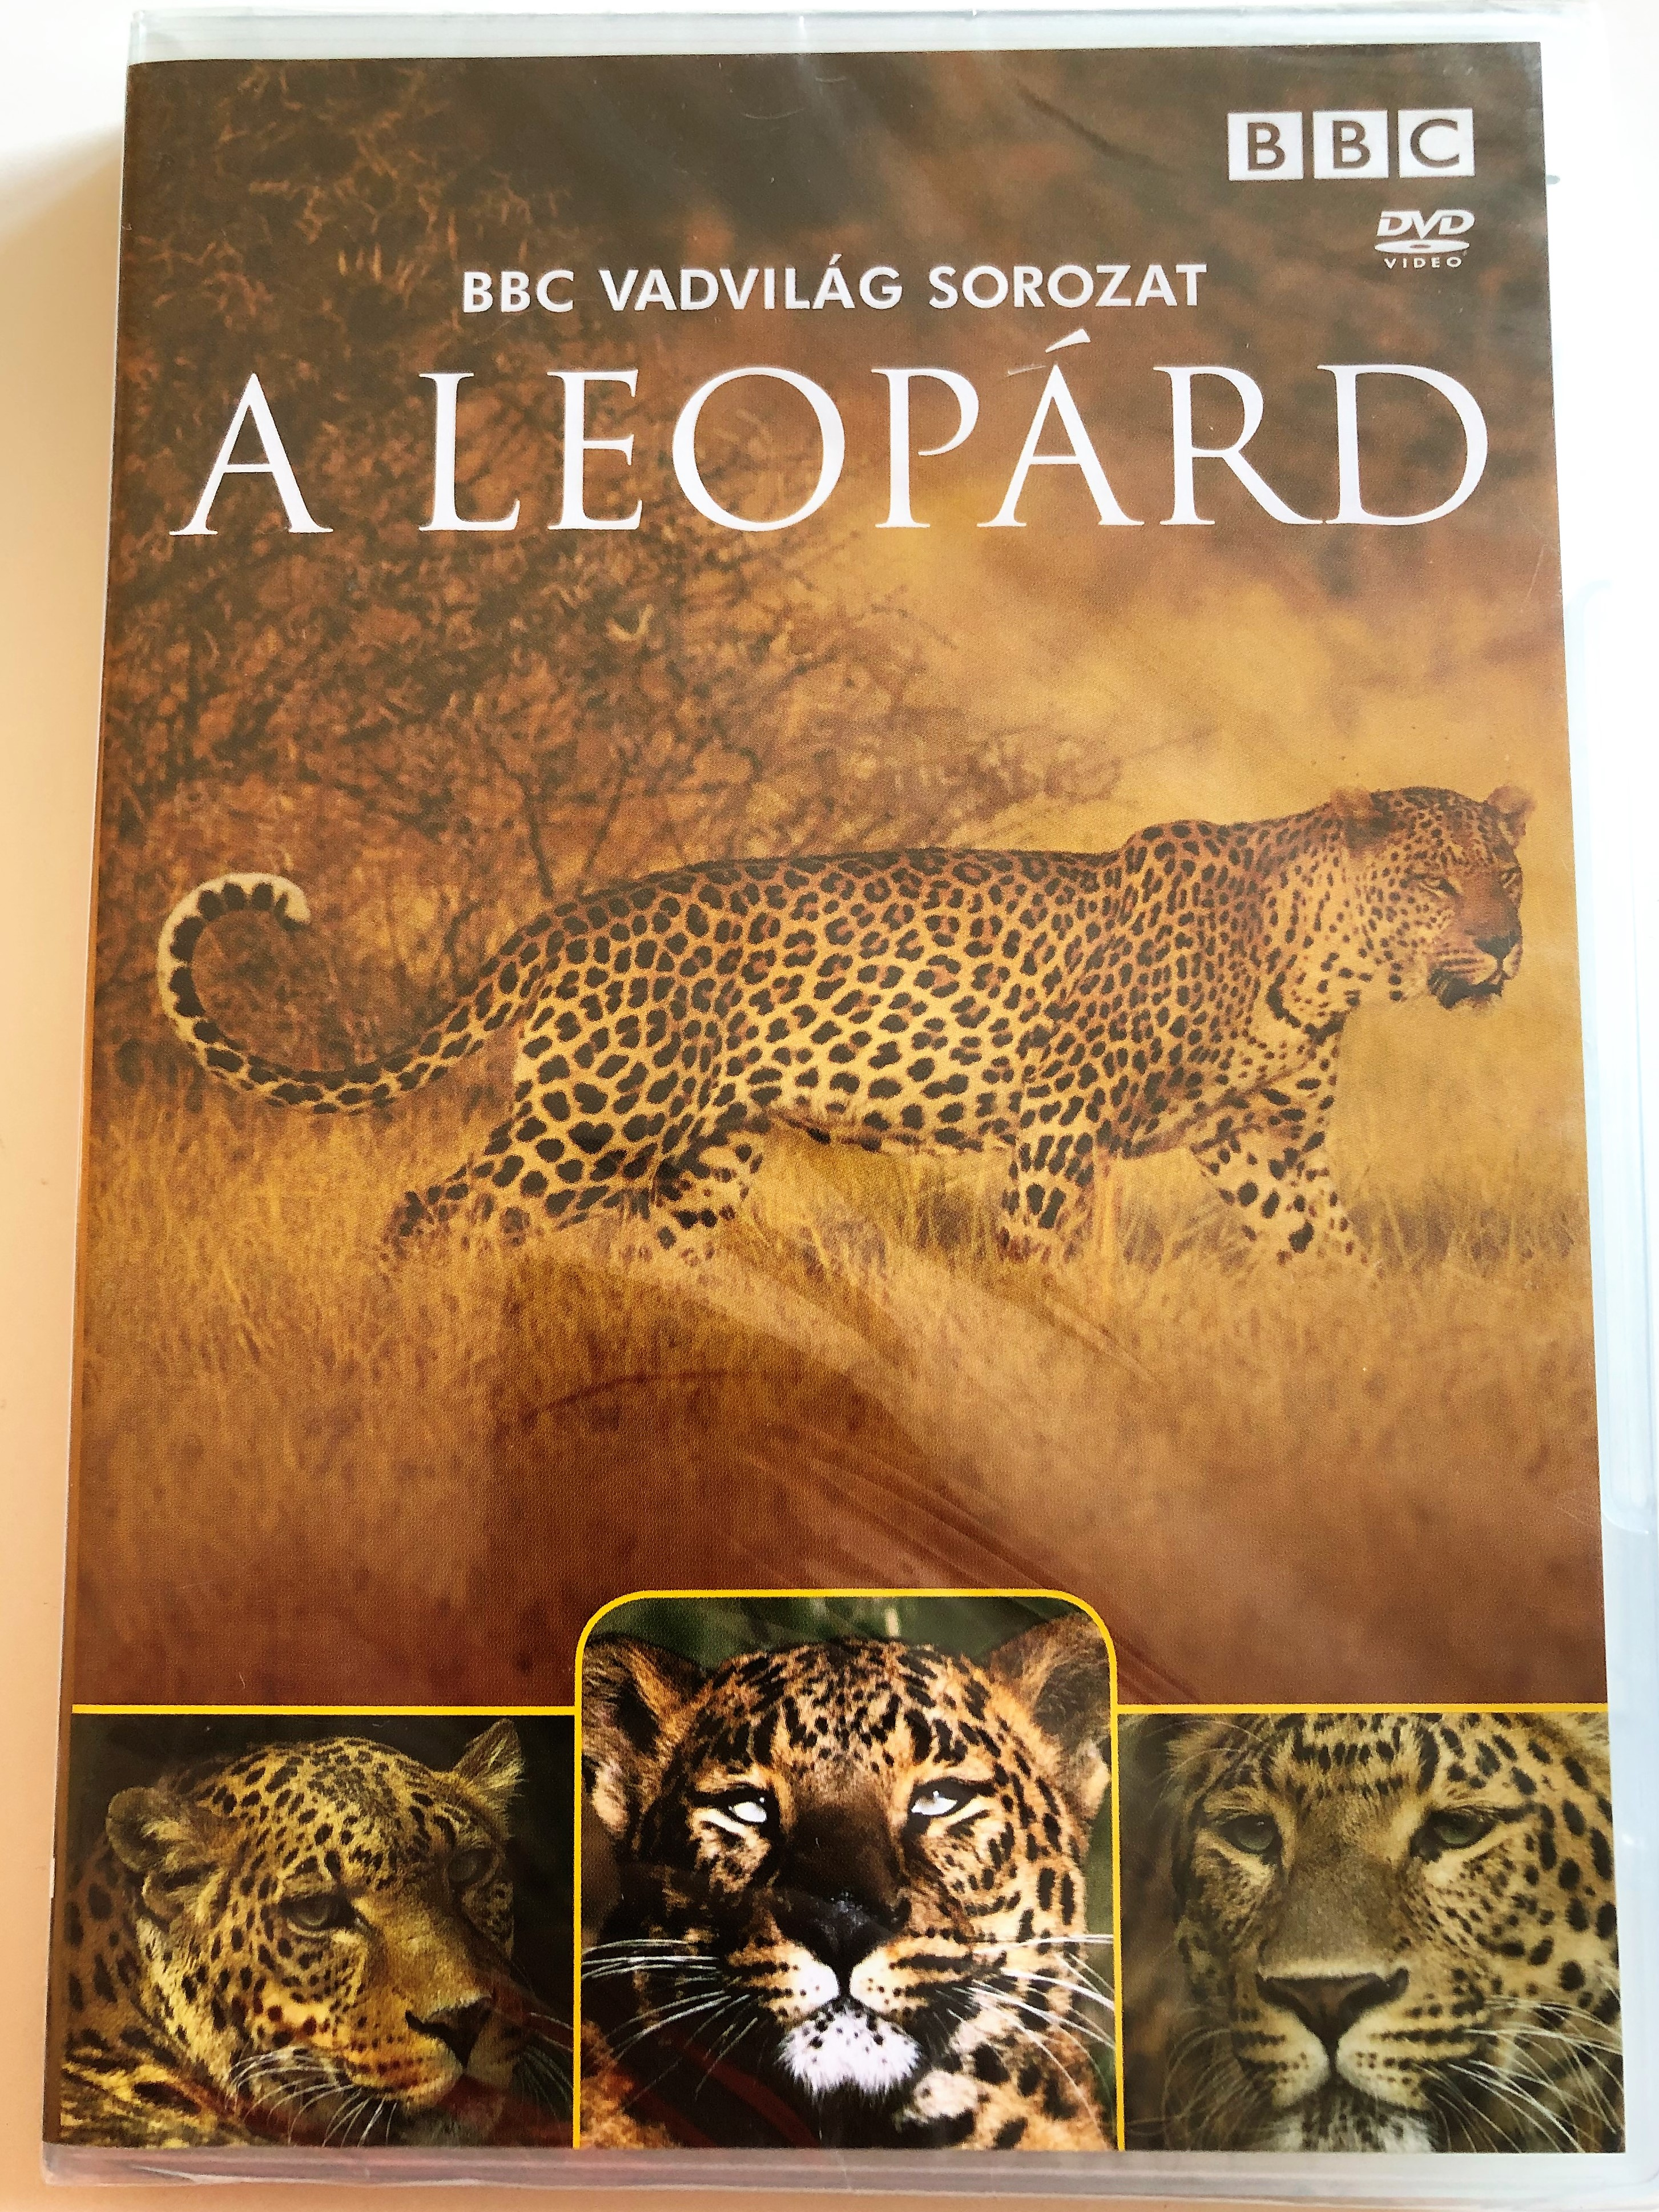 a-leop-rd-the-lepard-bbc-wildlife-series-narrated-by-sir-david-attenborough-dvd-2004-bbc-vadvil-g-sorozat-1-.jpg